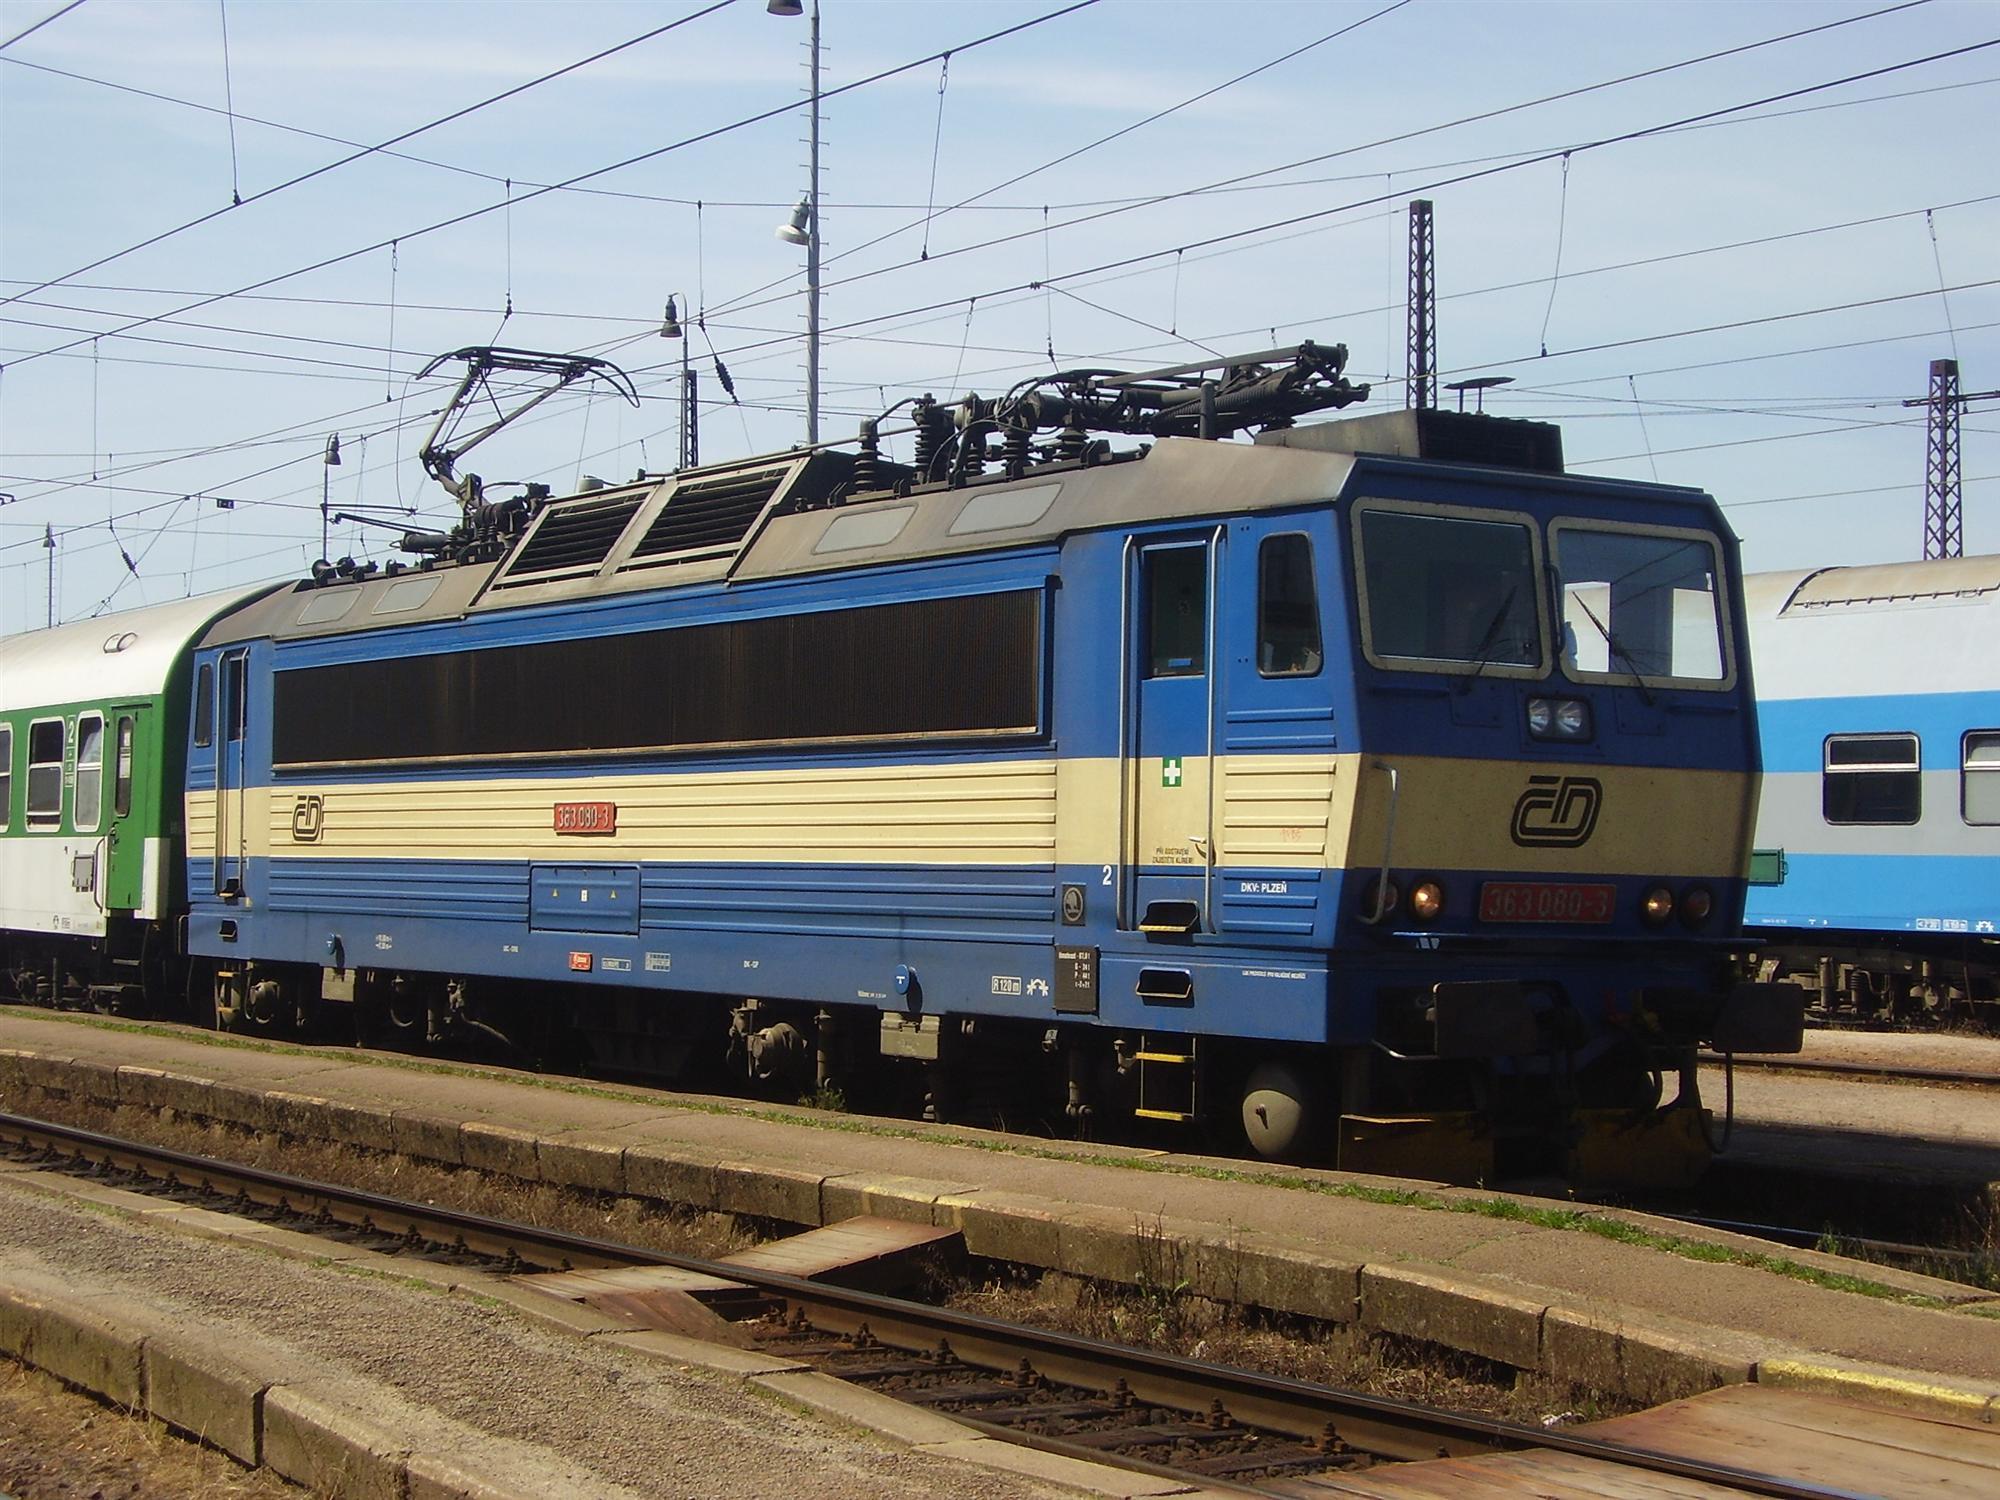 File:Cercany-lokomotiva 363.jpg